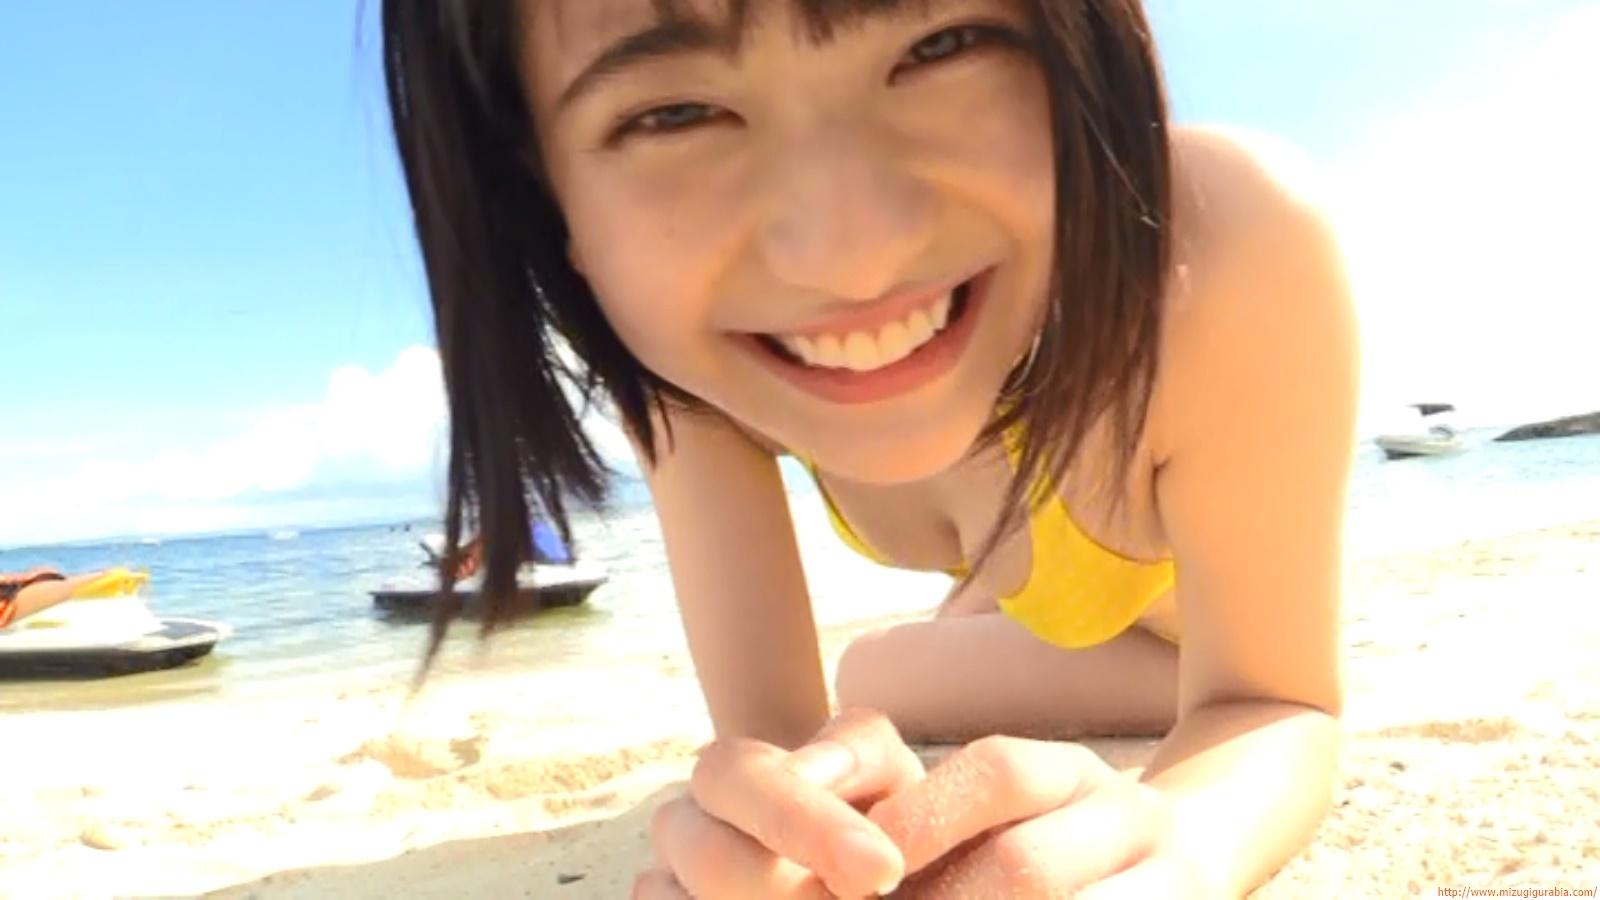 Beach dating239